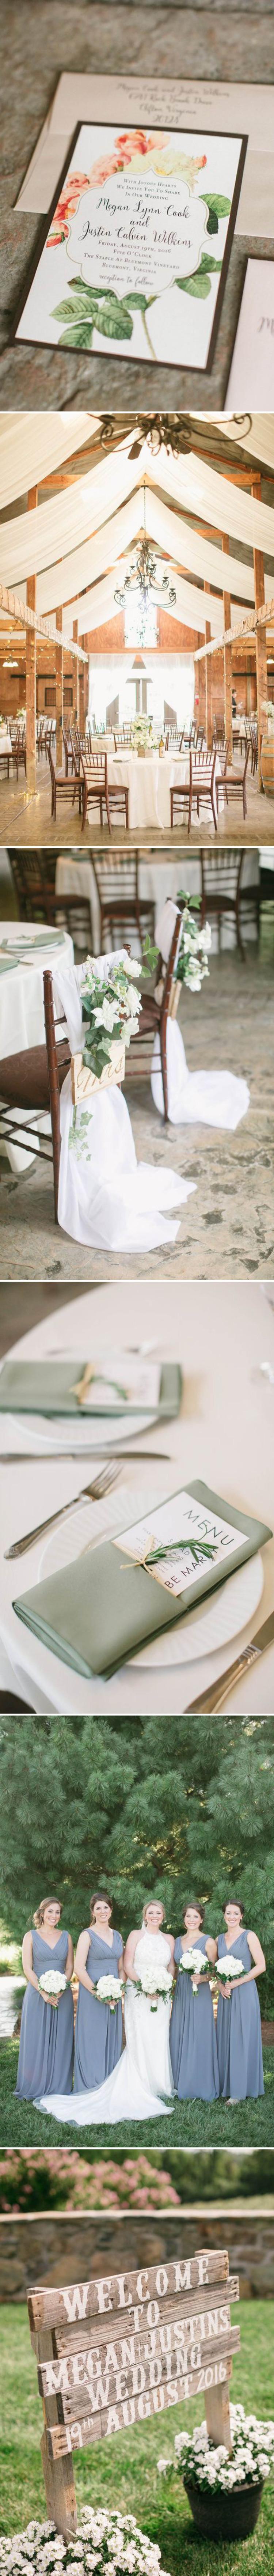 Romantic Vineyard Wedding | Beacon Lane Real Wedding